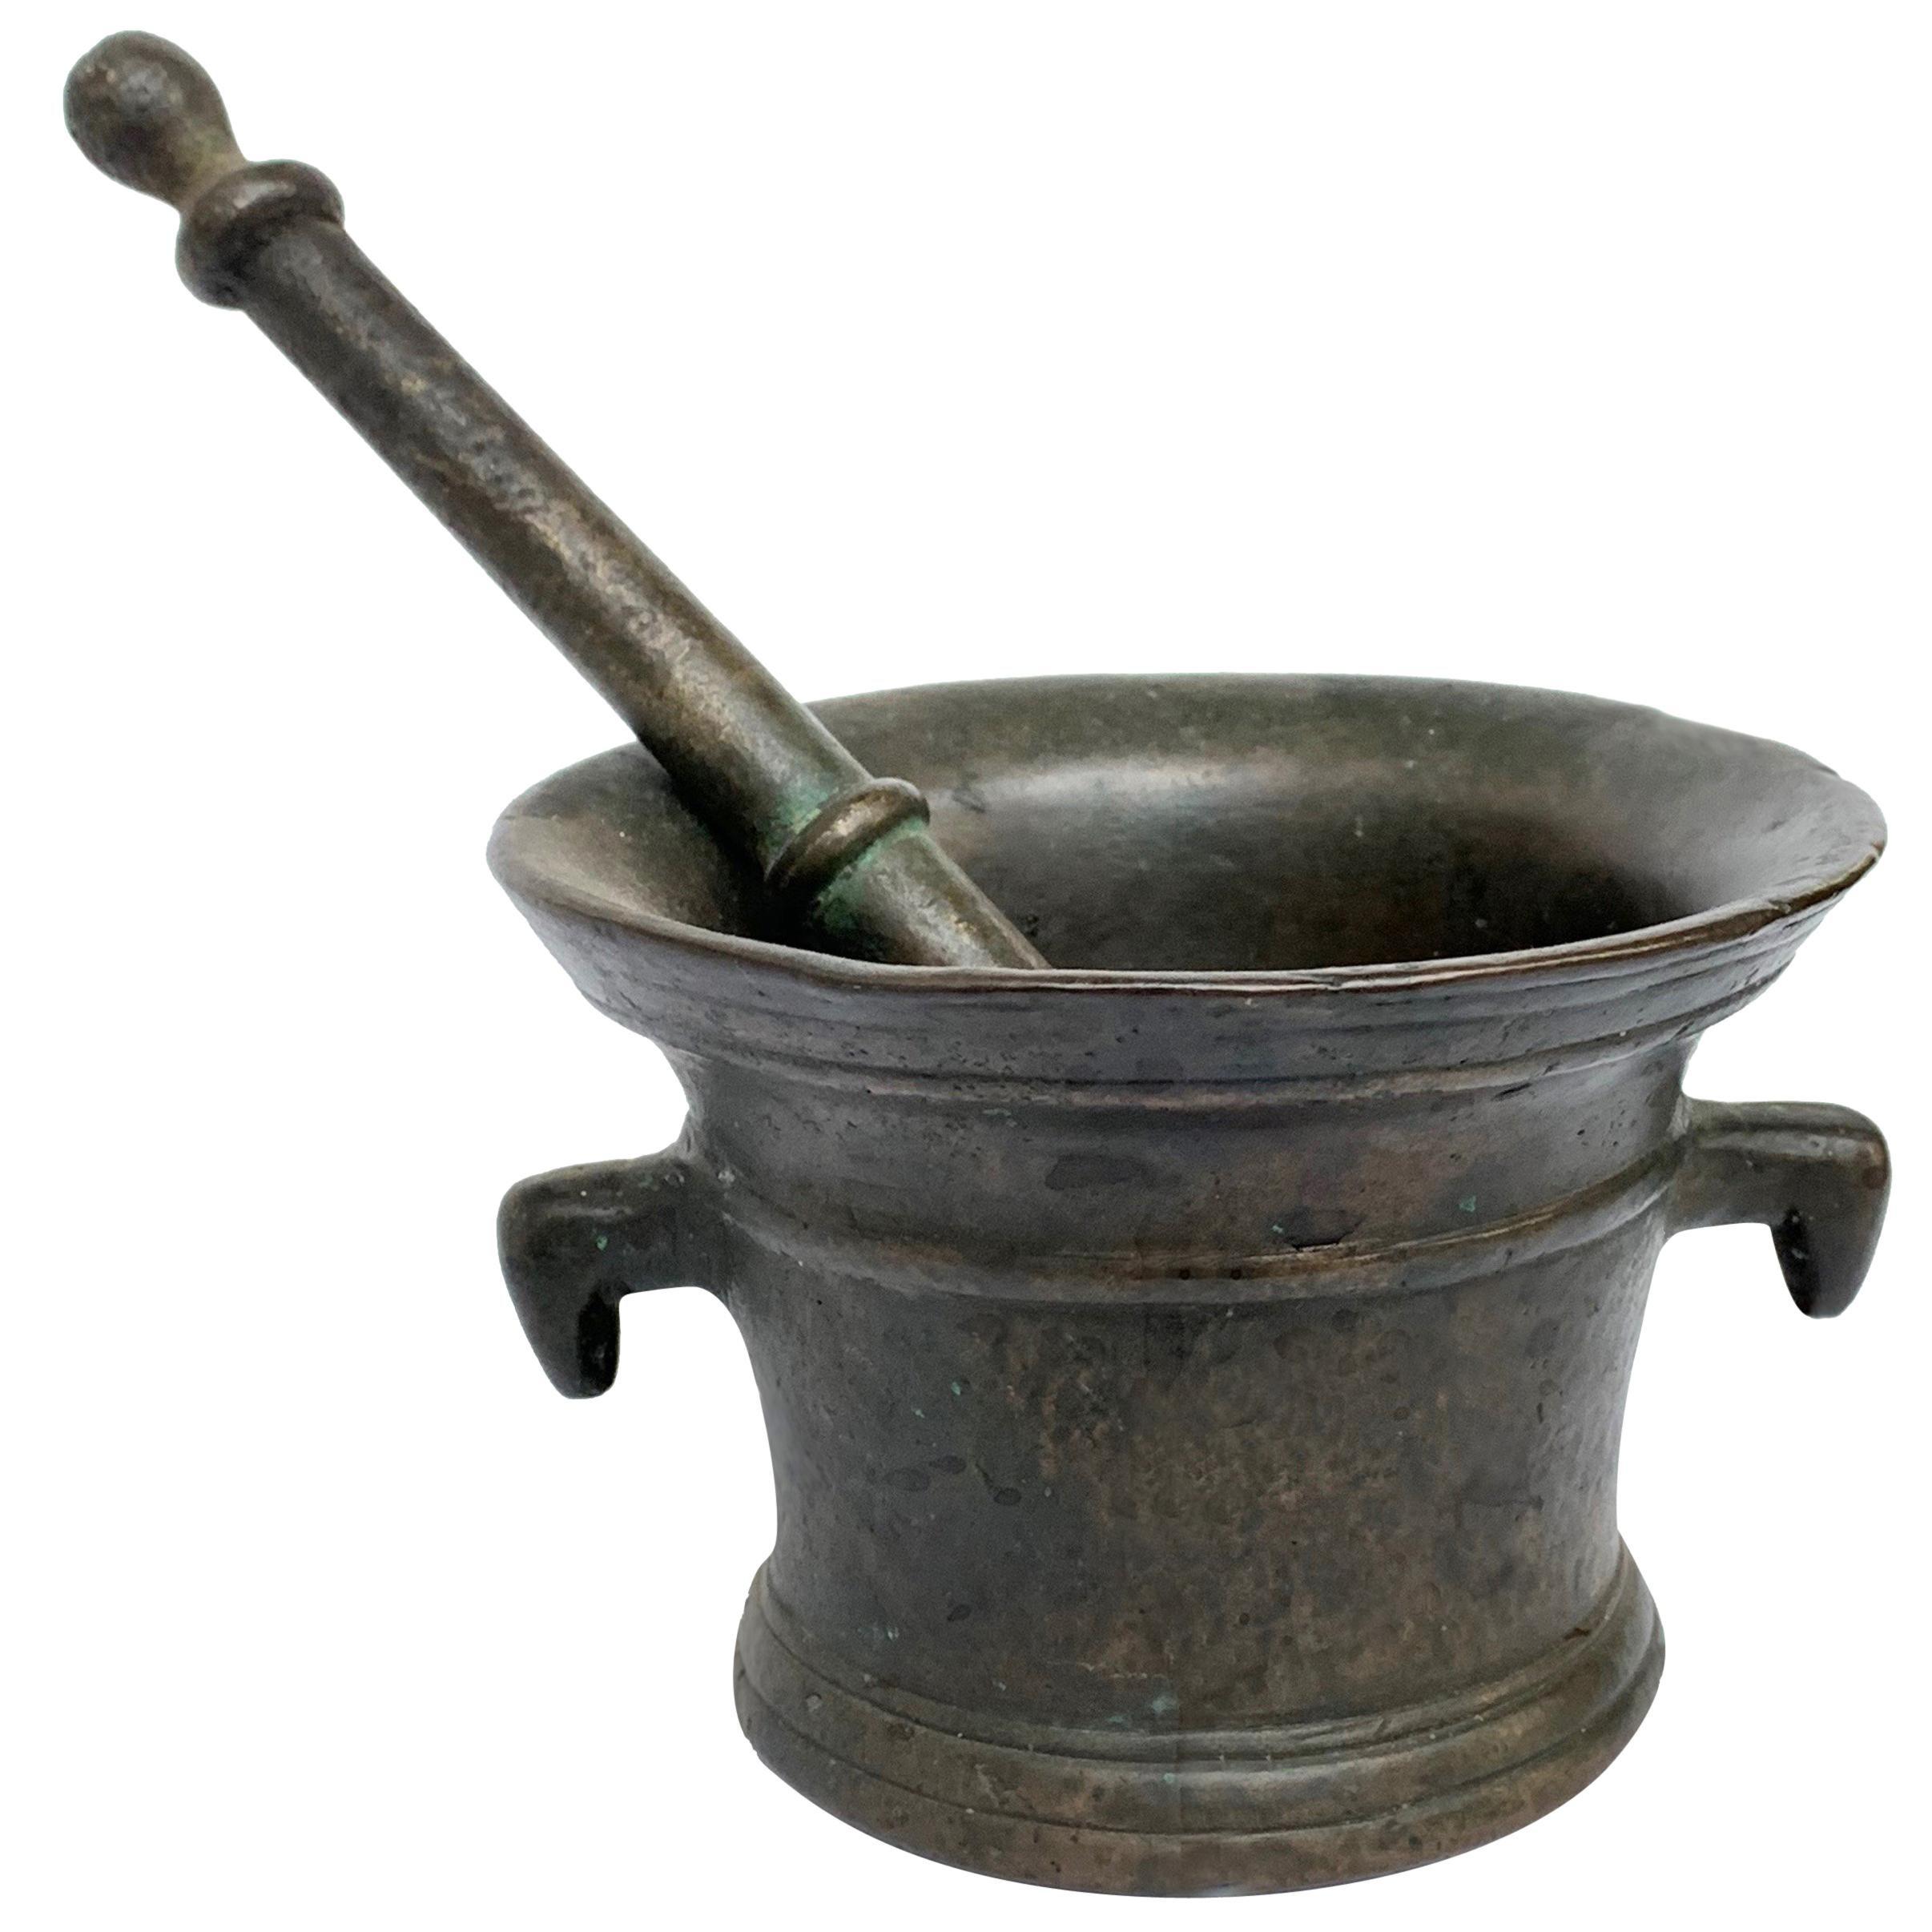 Italian Bronze Mortar and Pestle, Original Patina, Italy, Pharmacy or Herbalist